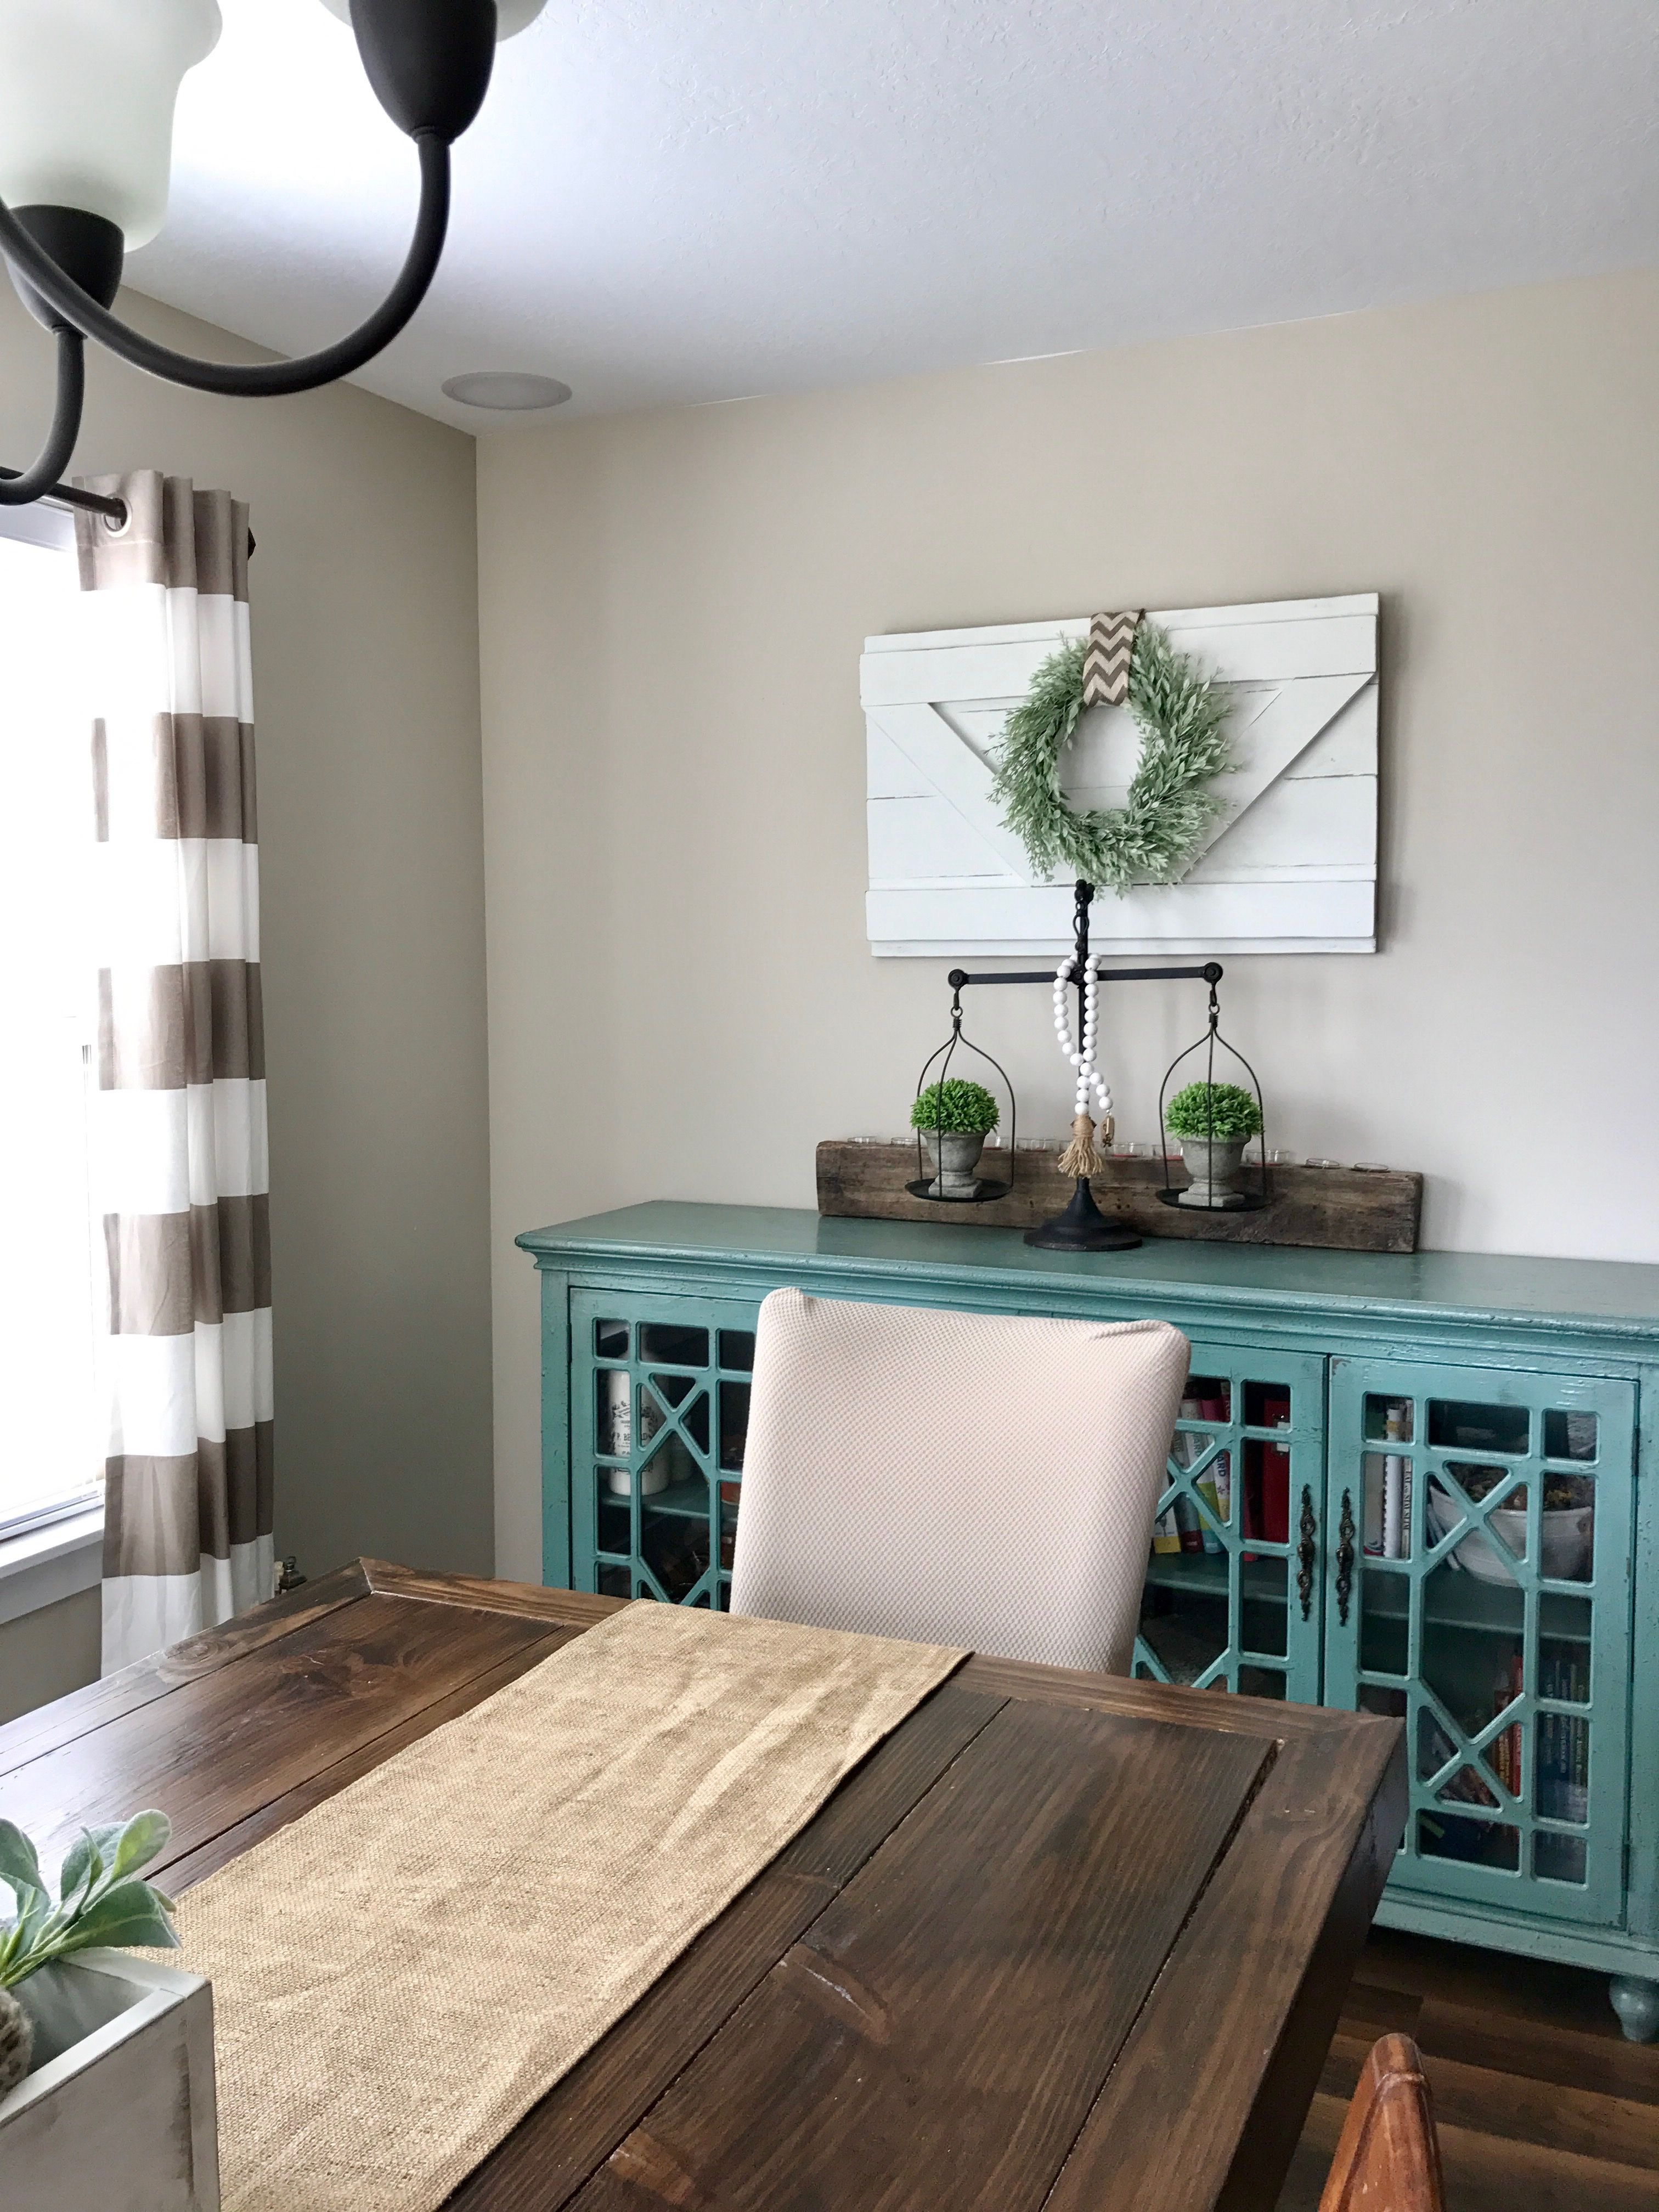 Extra Large Decorative Wood Shutter. Rustic Wall Decor. Farmhouse Shutter.  Barn Door Style. Interior Shutter. Wreath Holder. Shiplap Sign